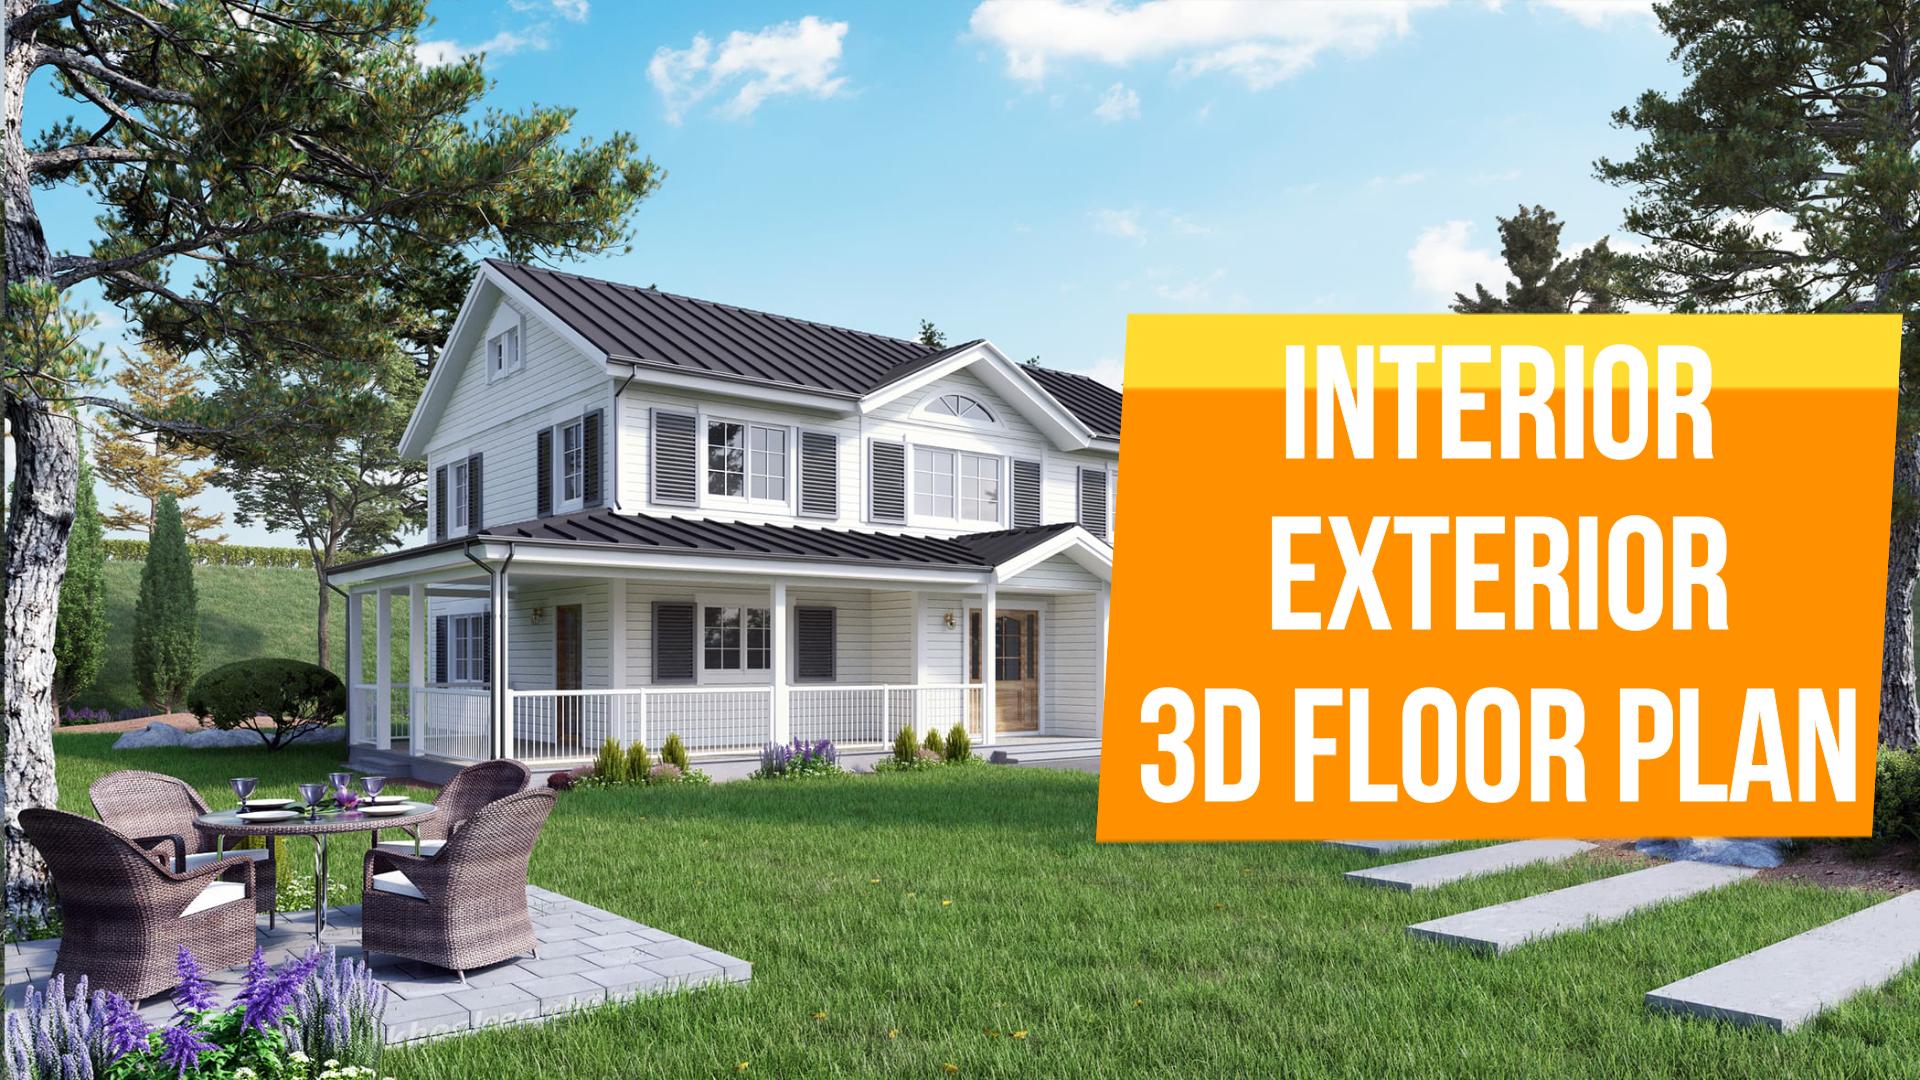 I Will Create Interior Exterior 3d Floor Plan Etc Floor Plans Exterior Interior And Exterior